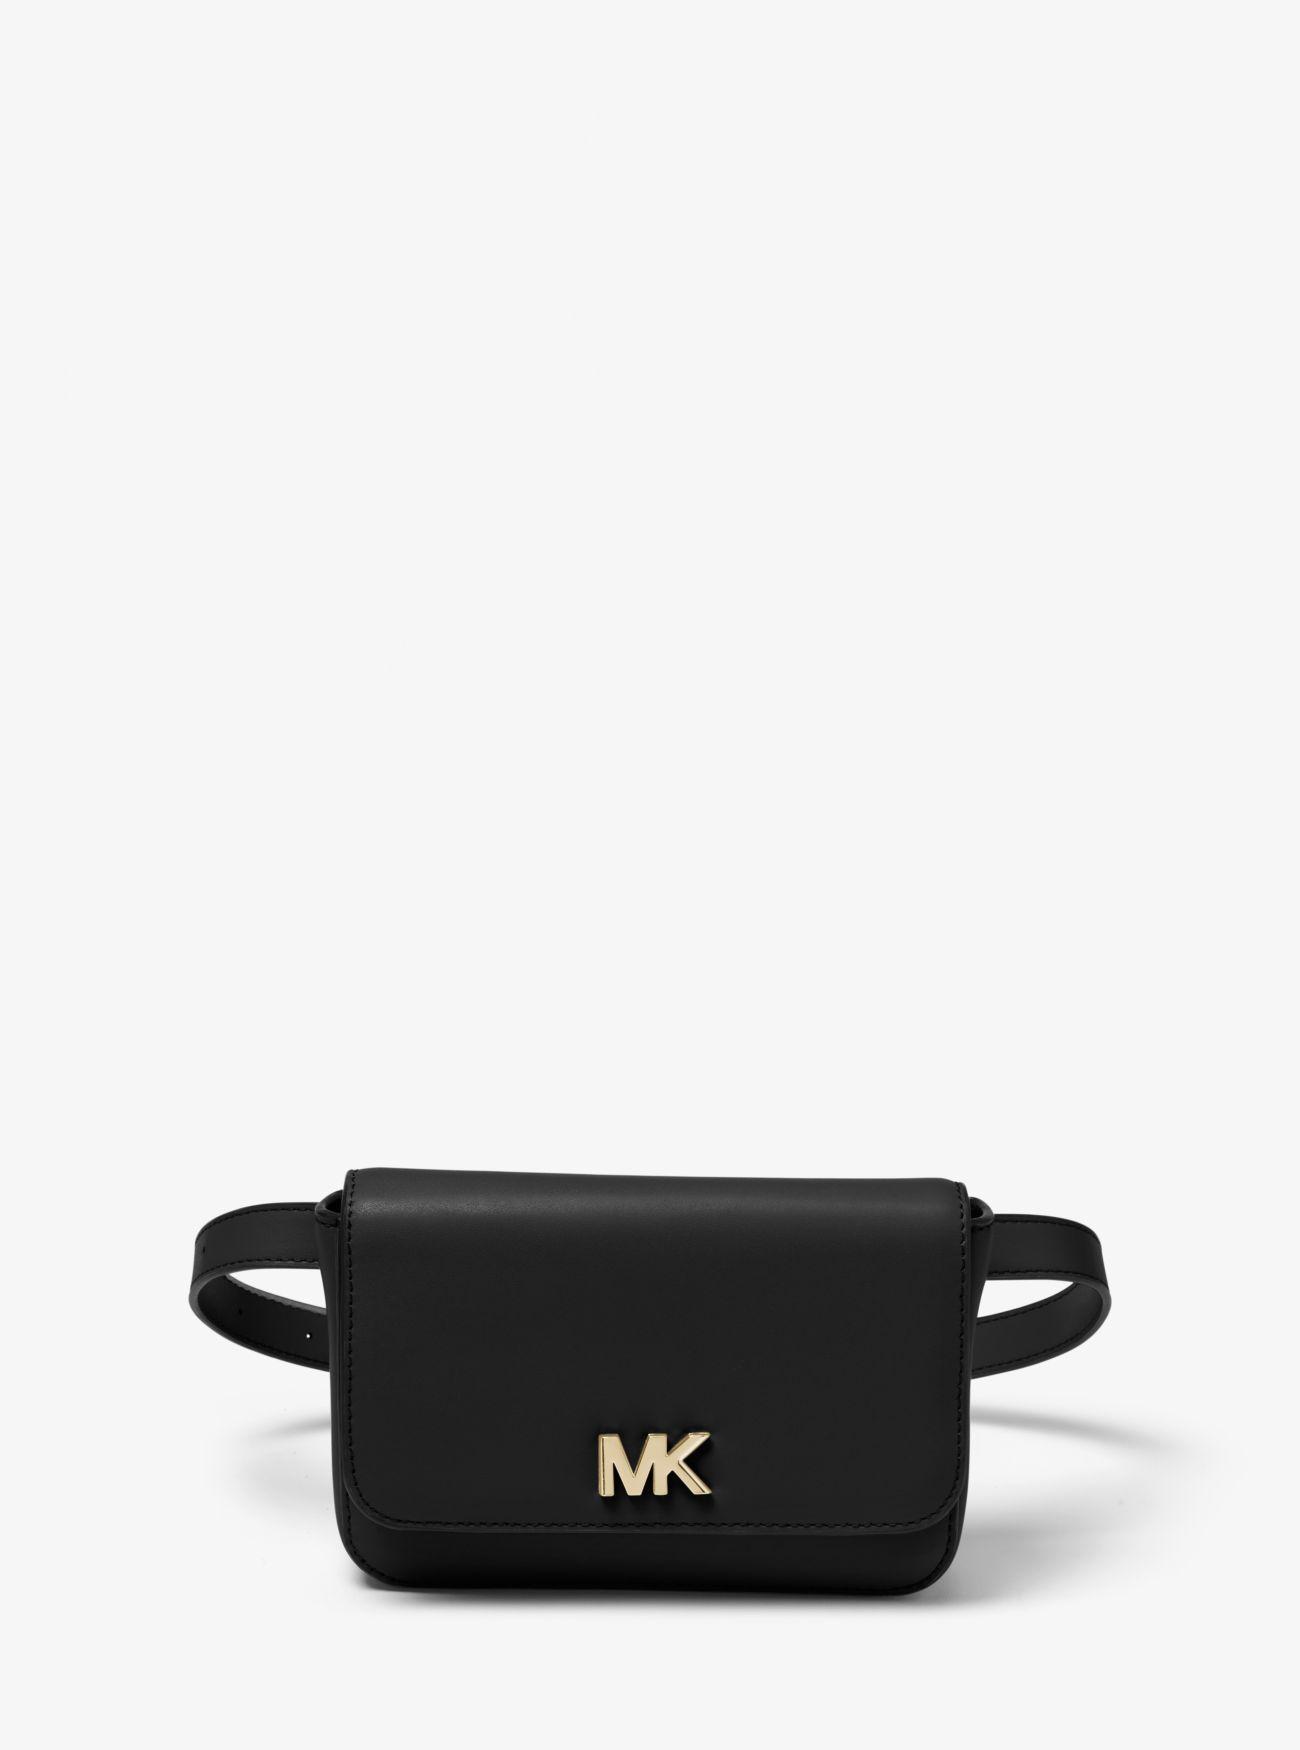 a66b5c63d742 Michael Kors Mott Leather Belt Bag in Black - Save 35% - Lyst